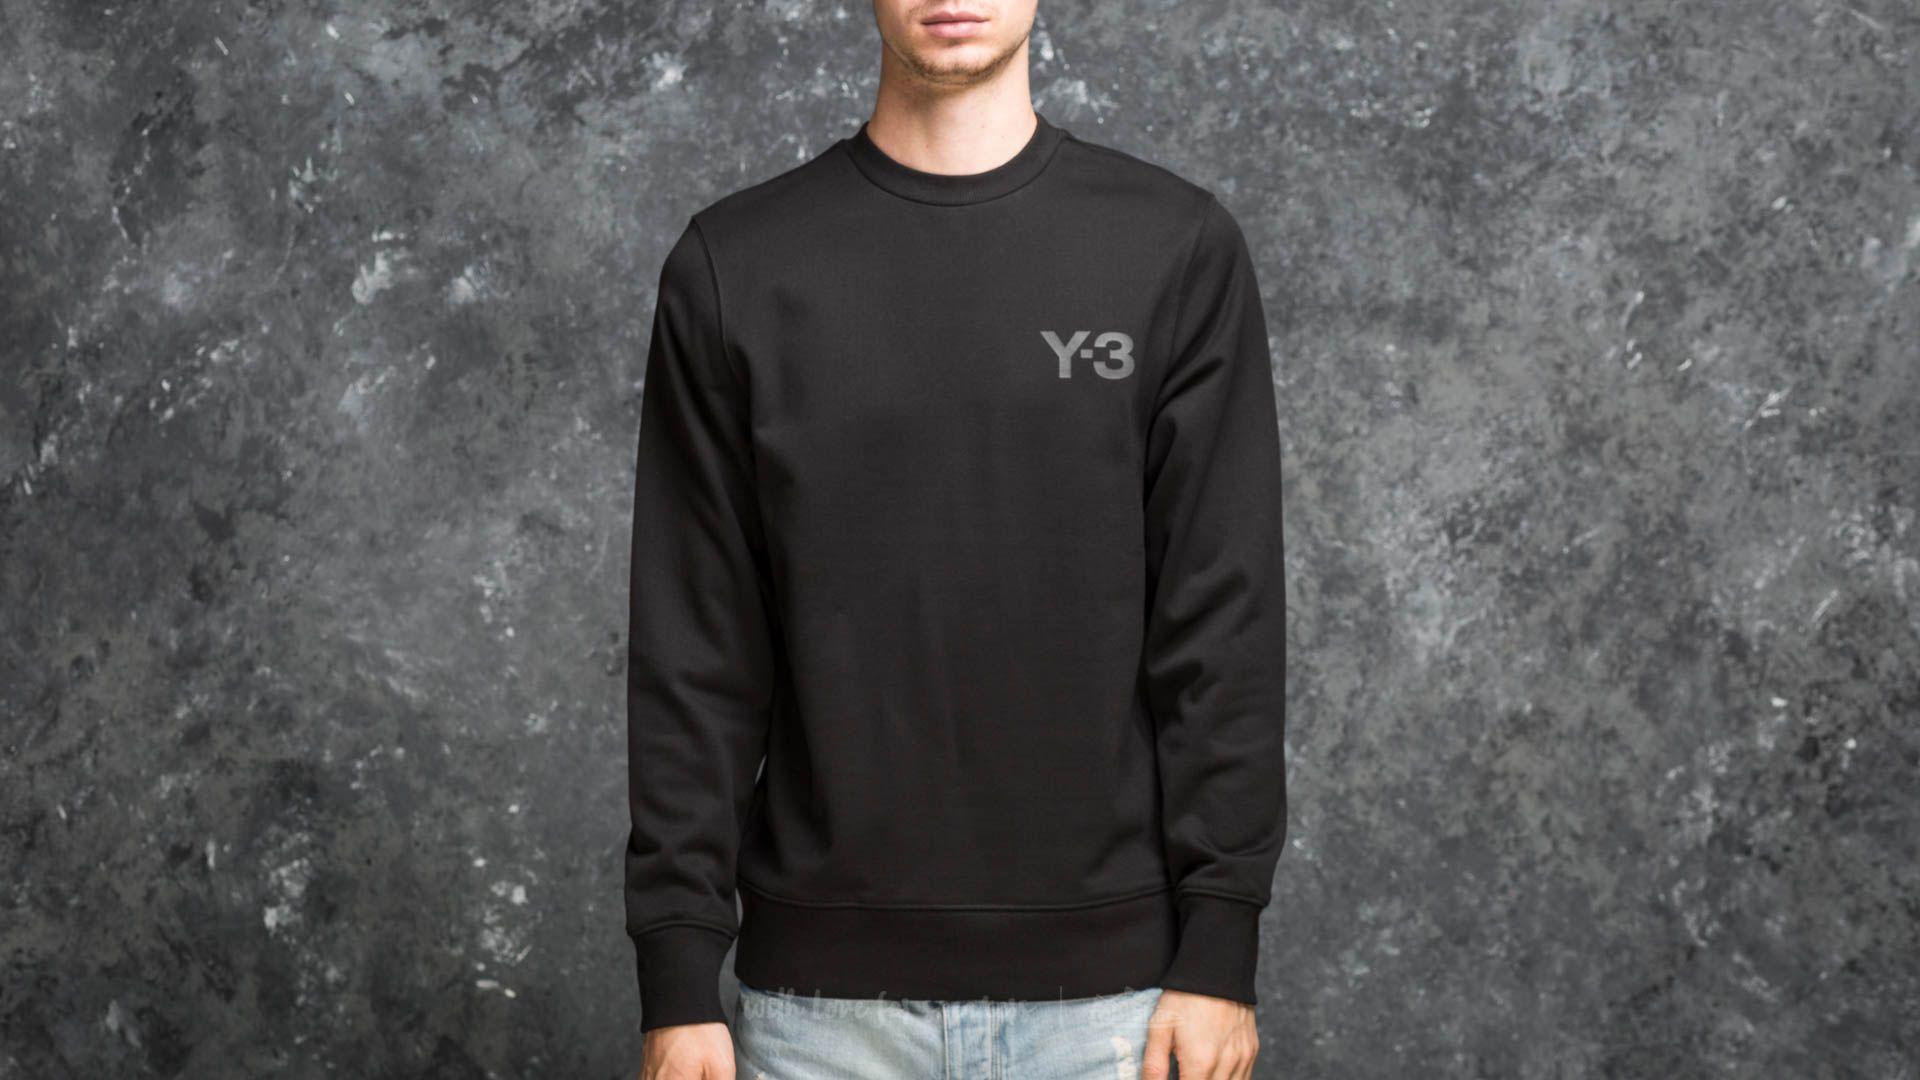 Y-3 M Classic Crew Sweatshirt Black - 18006